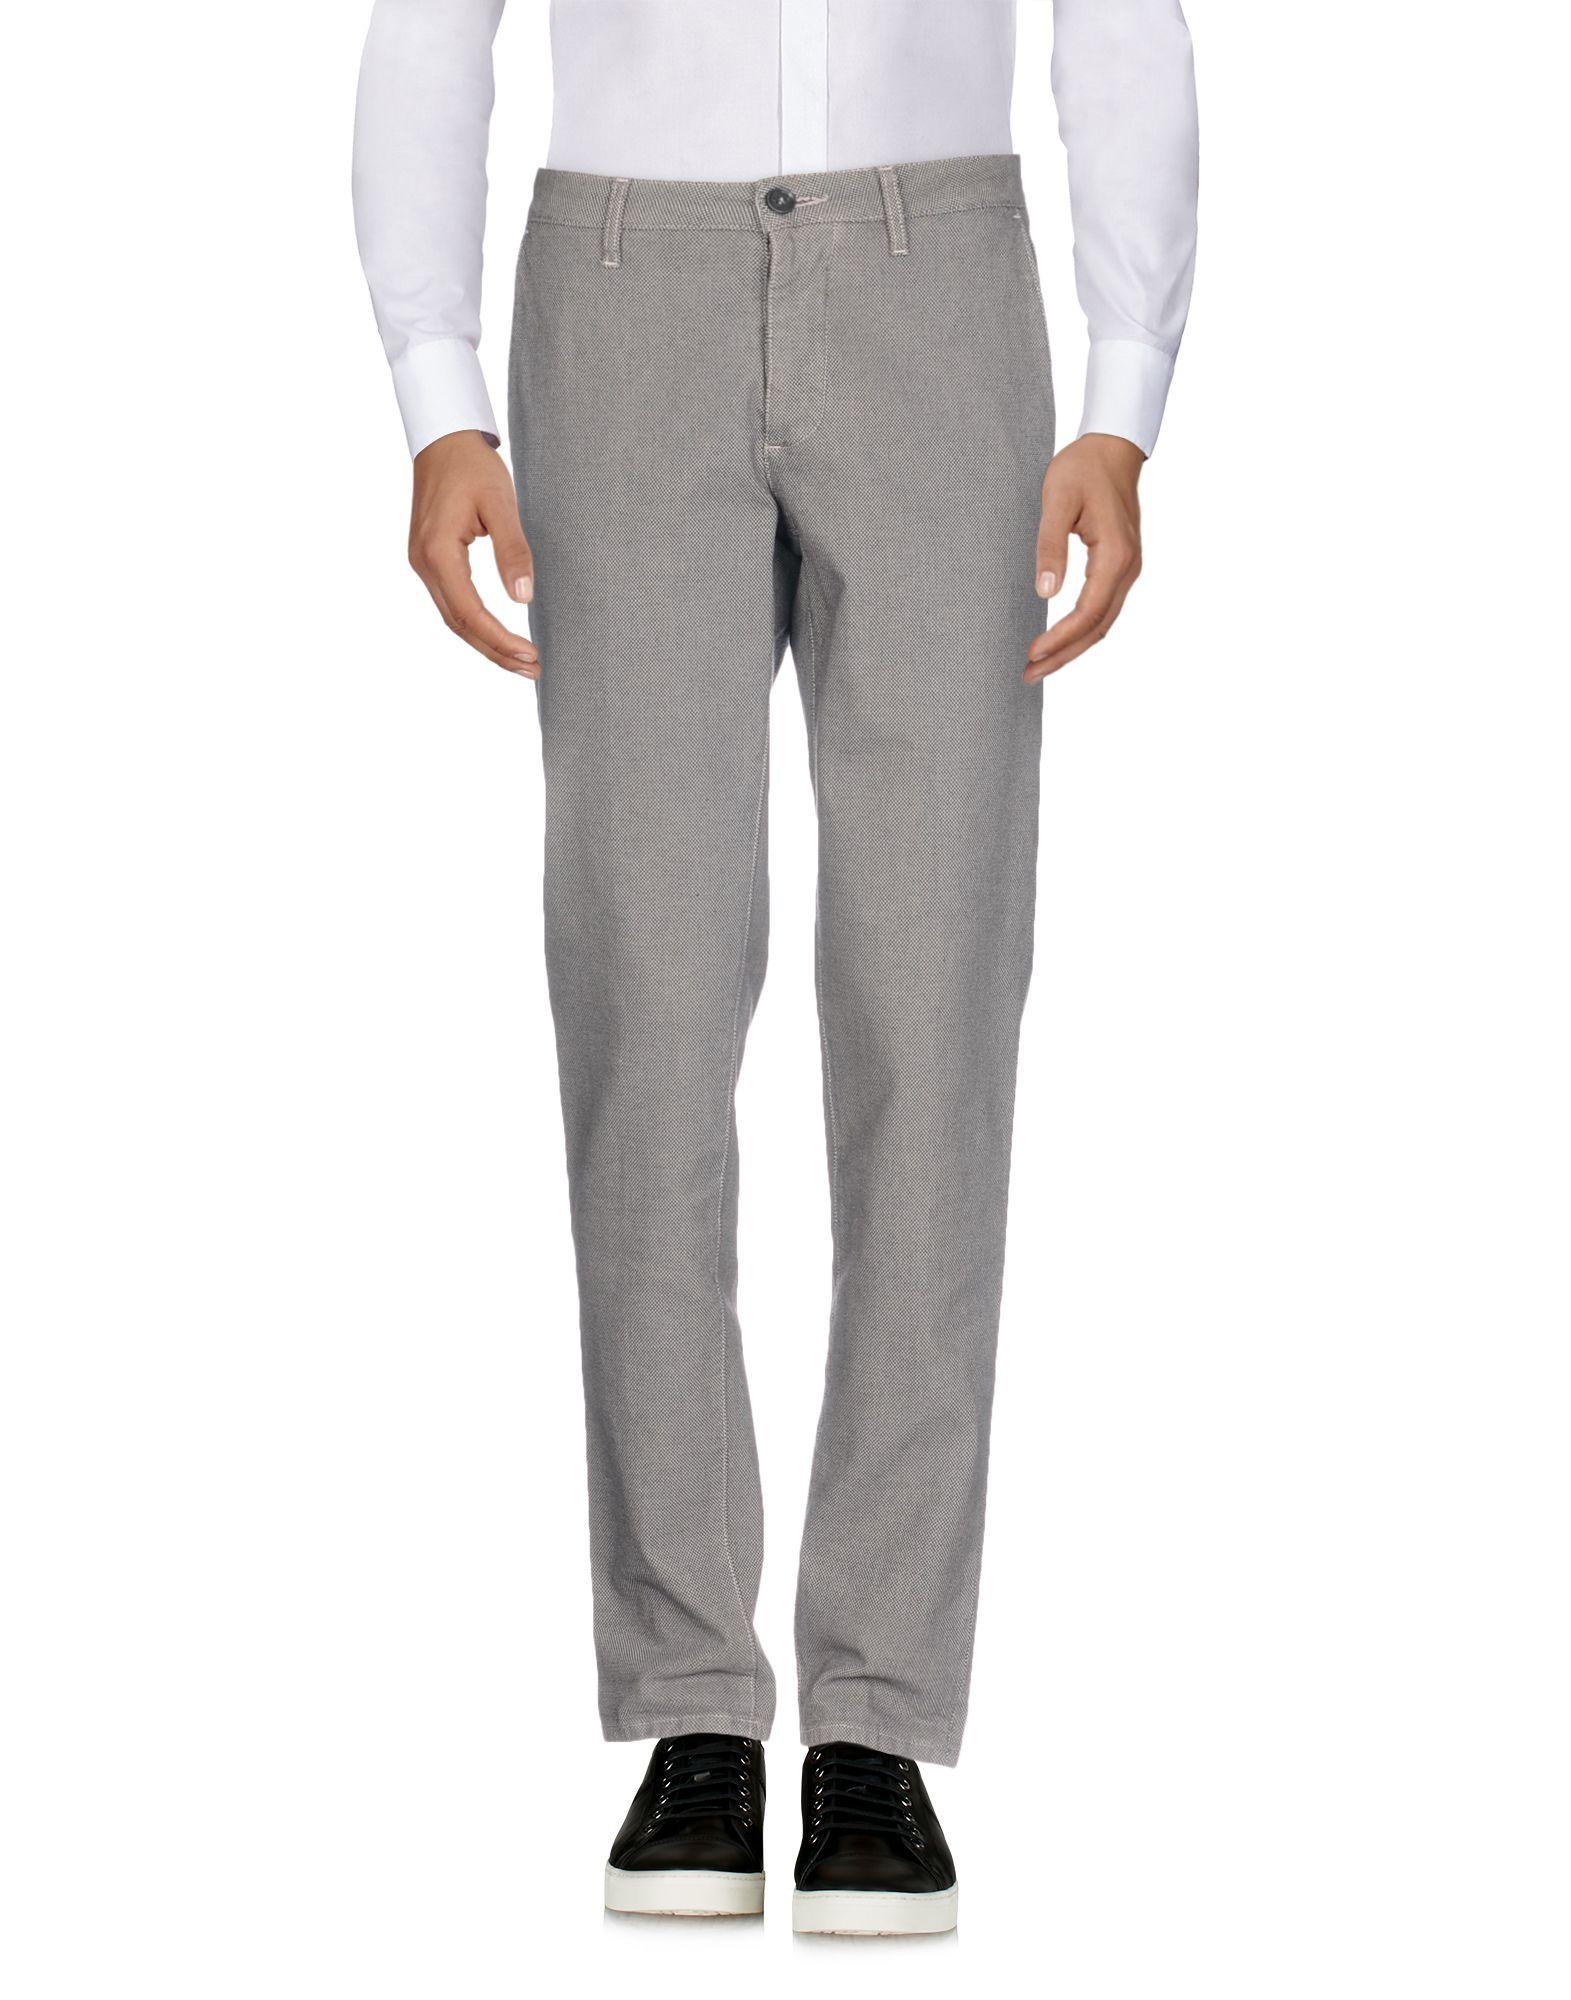 CRUNA Casual Pants in Grey